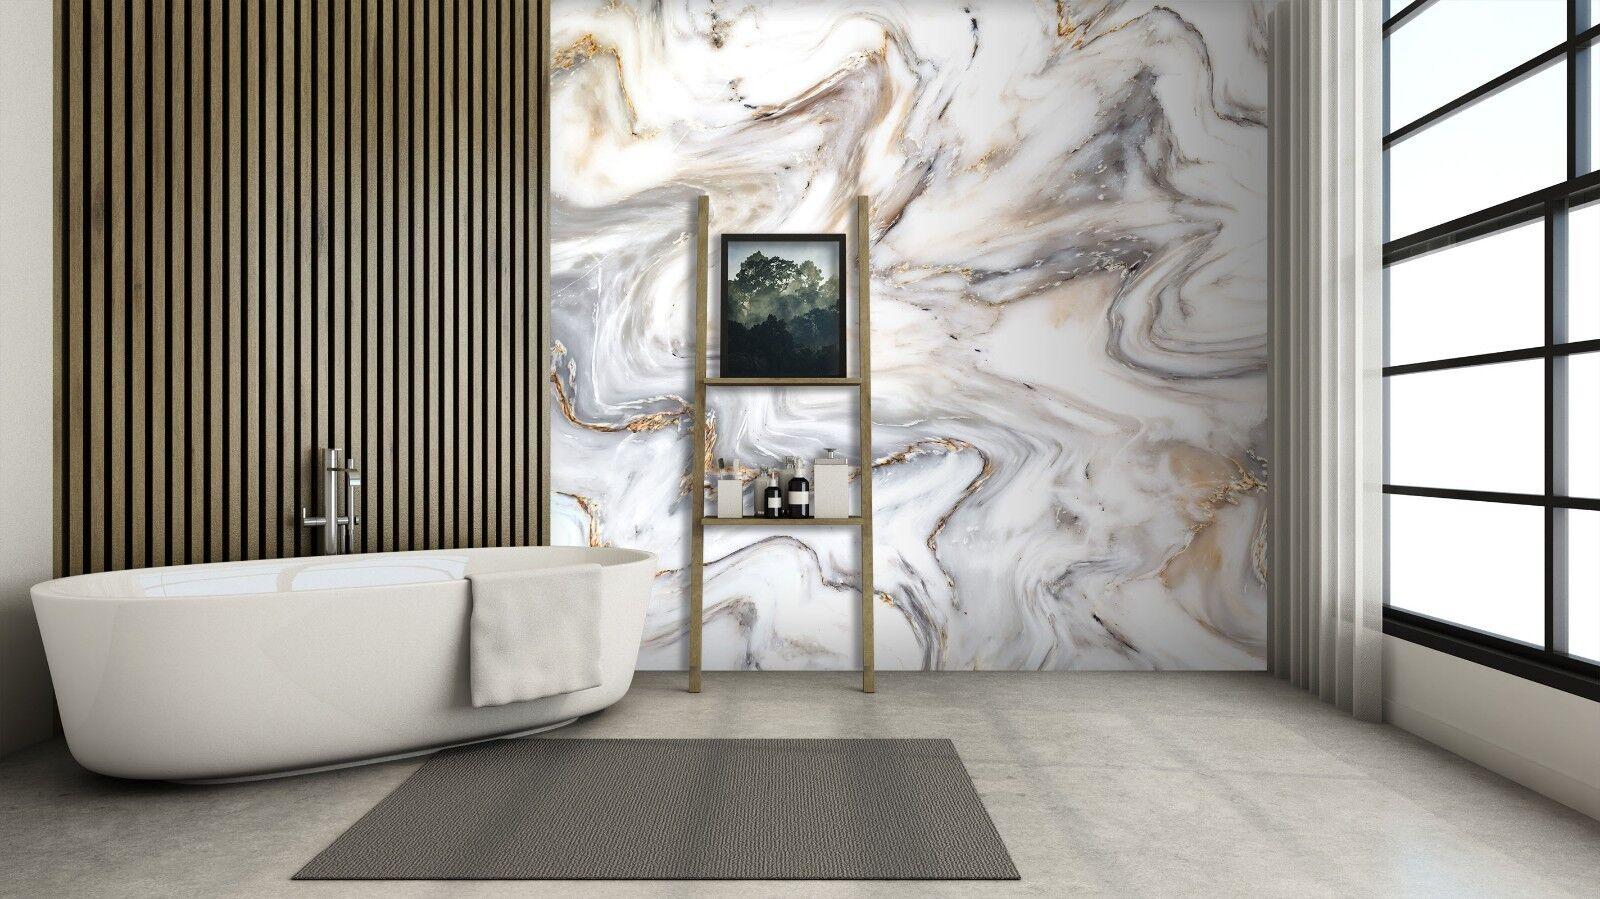 3D Weiß River Water 3 Texture Tiles Marble Wall Paper Decal Wallpaper Mural AJ